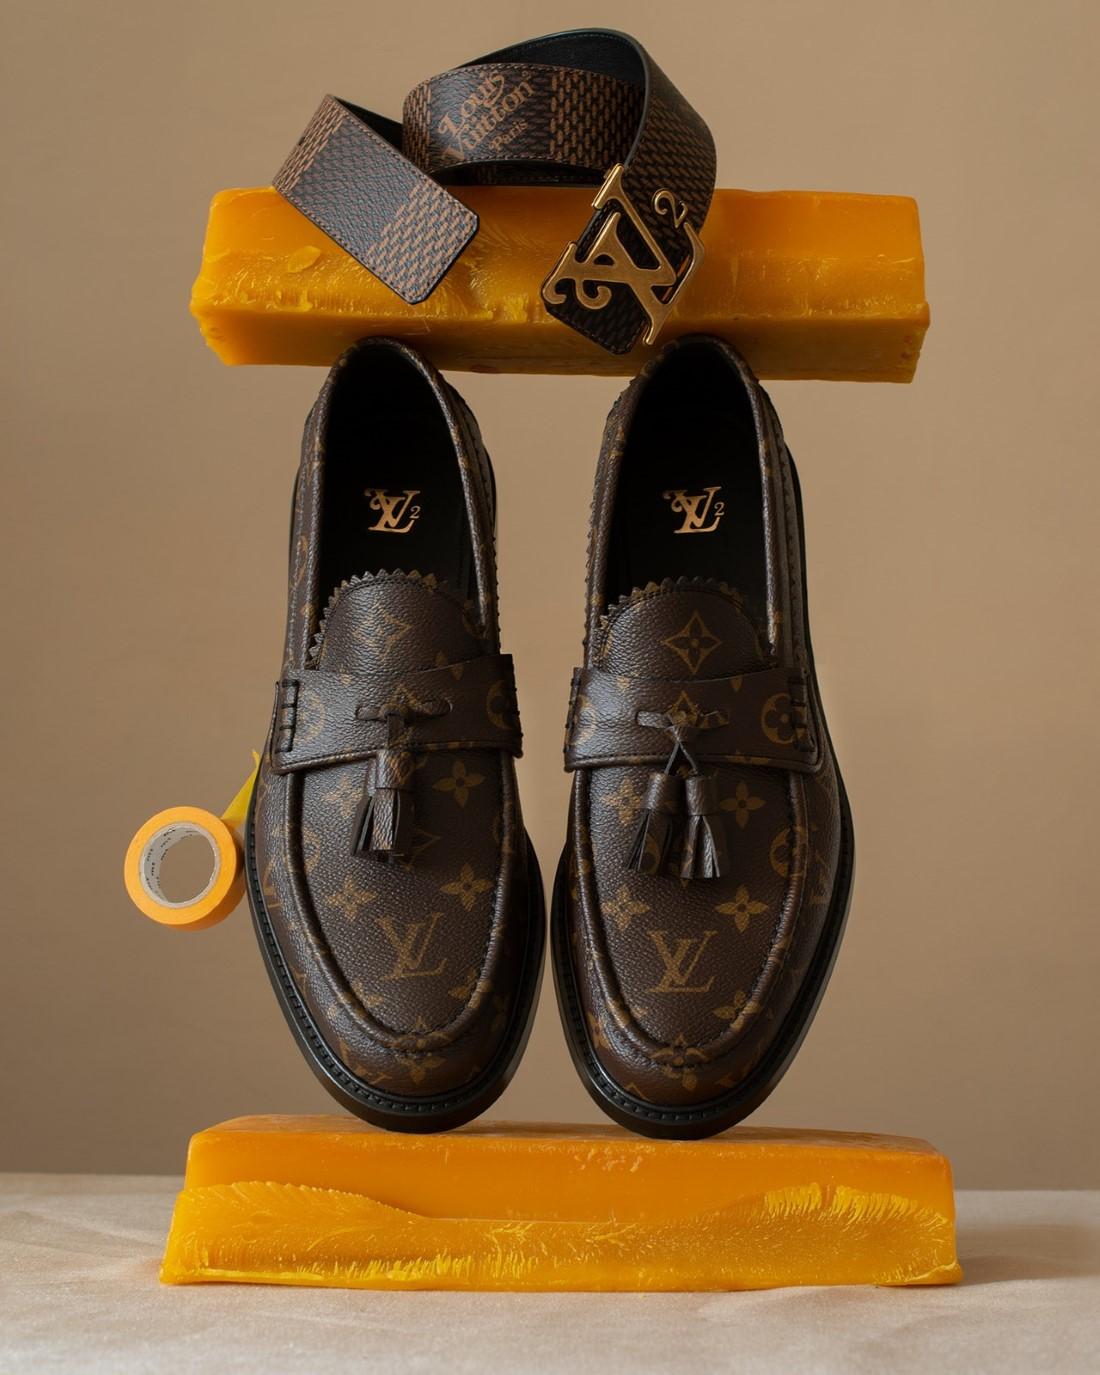 Nigo x Virgil Abloh - Louis Vuitton LV²